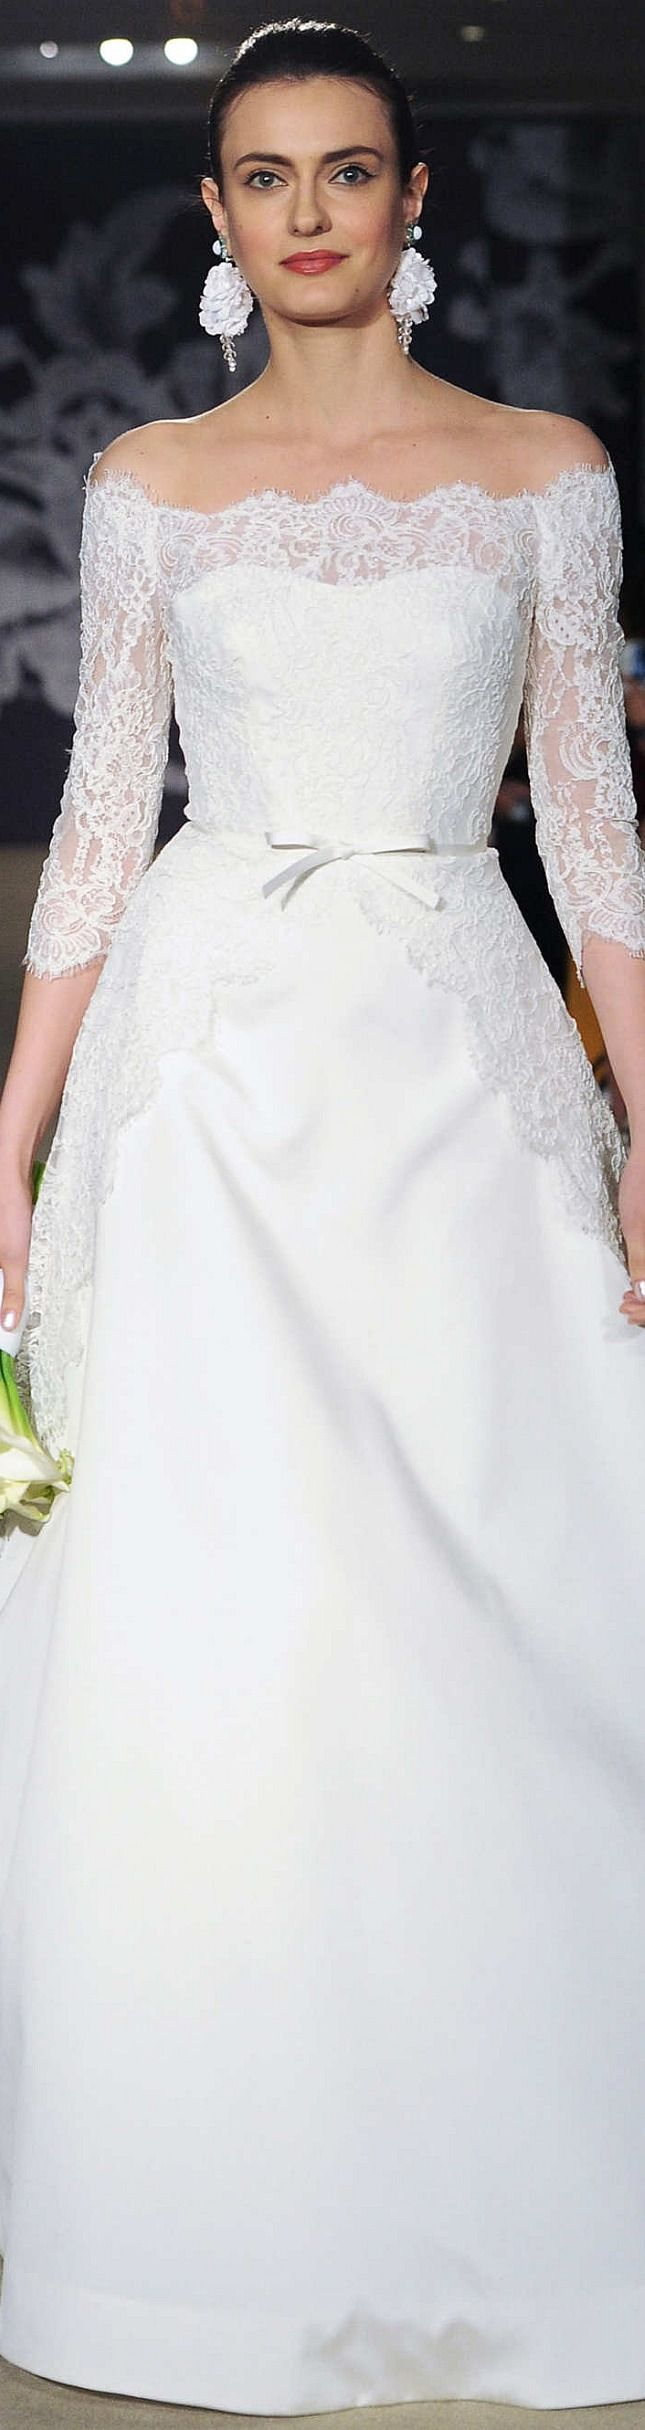 Tendance Robe De Mariée 2017/ 2018 : Carolina Herrera Collection Spring 2015 Bridal...